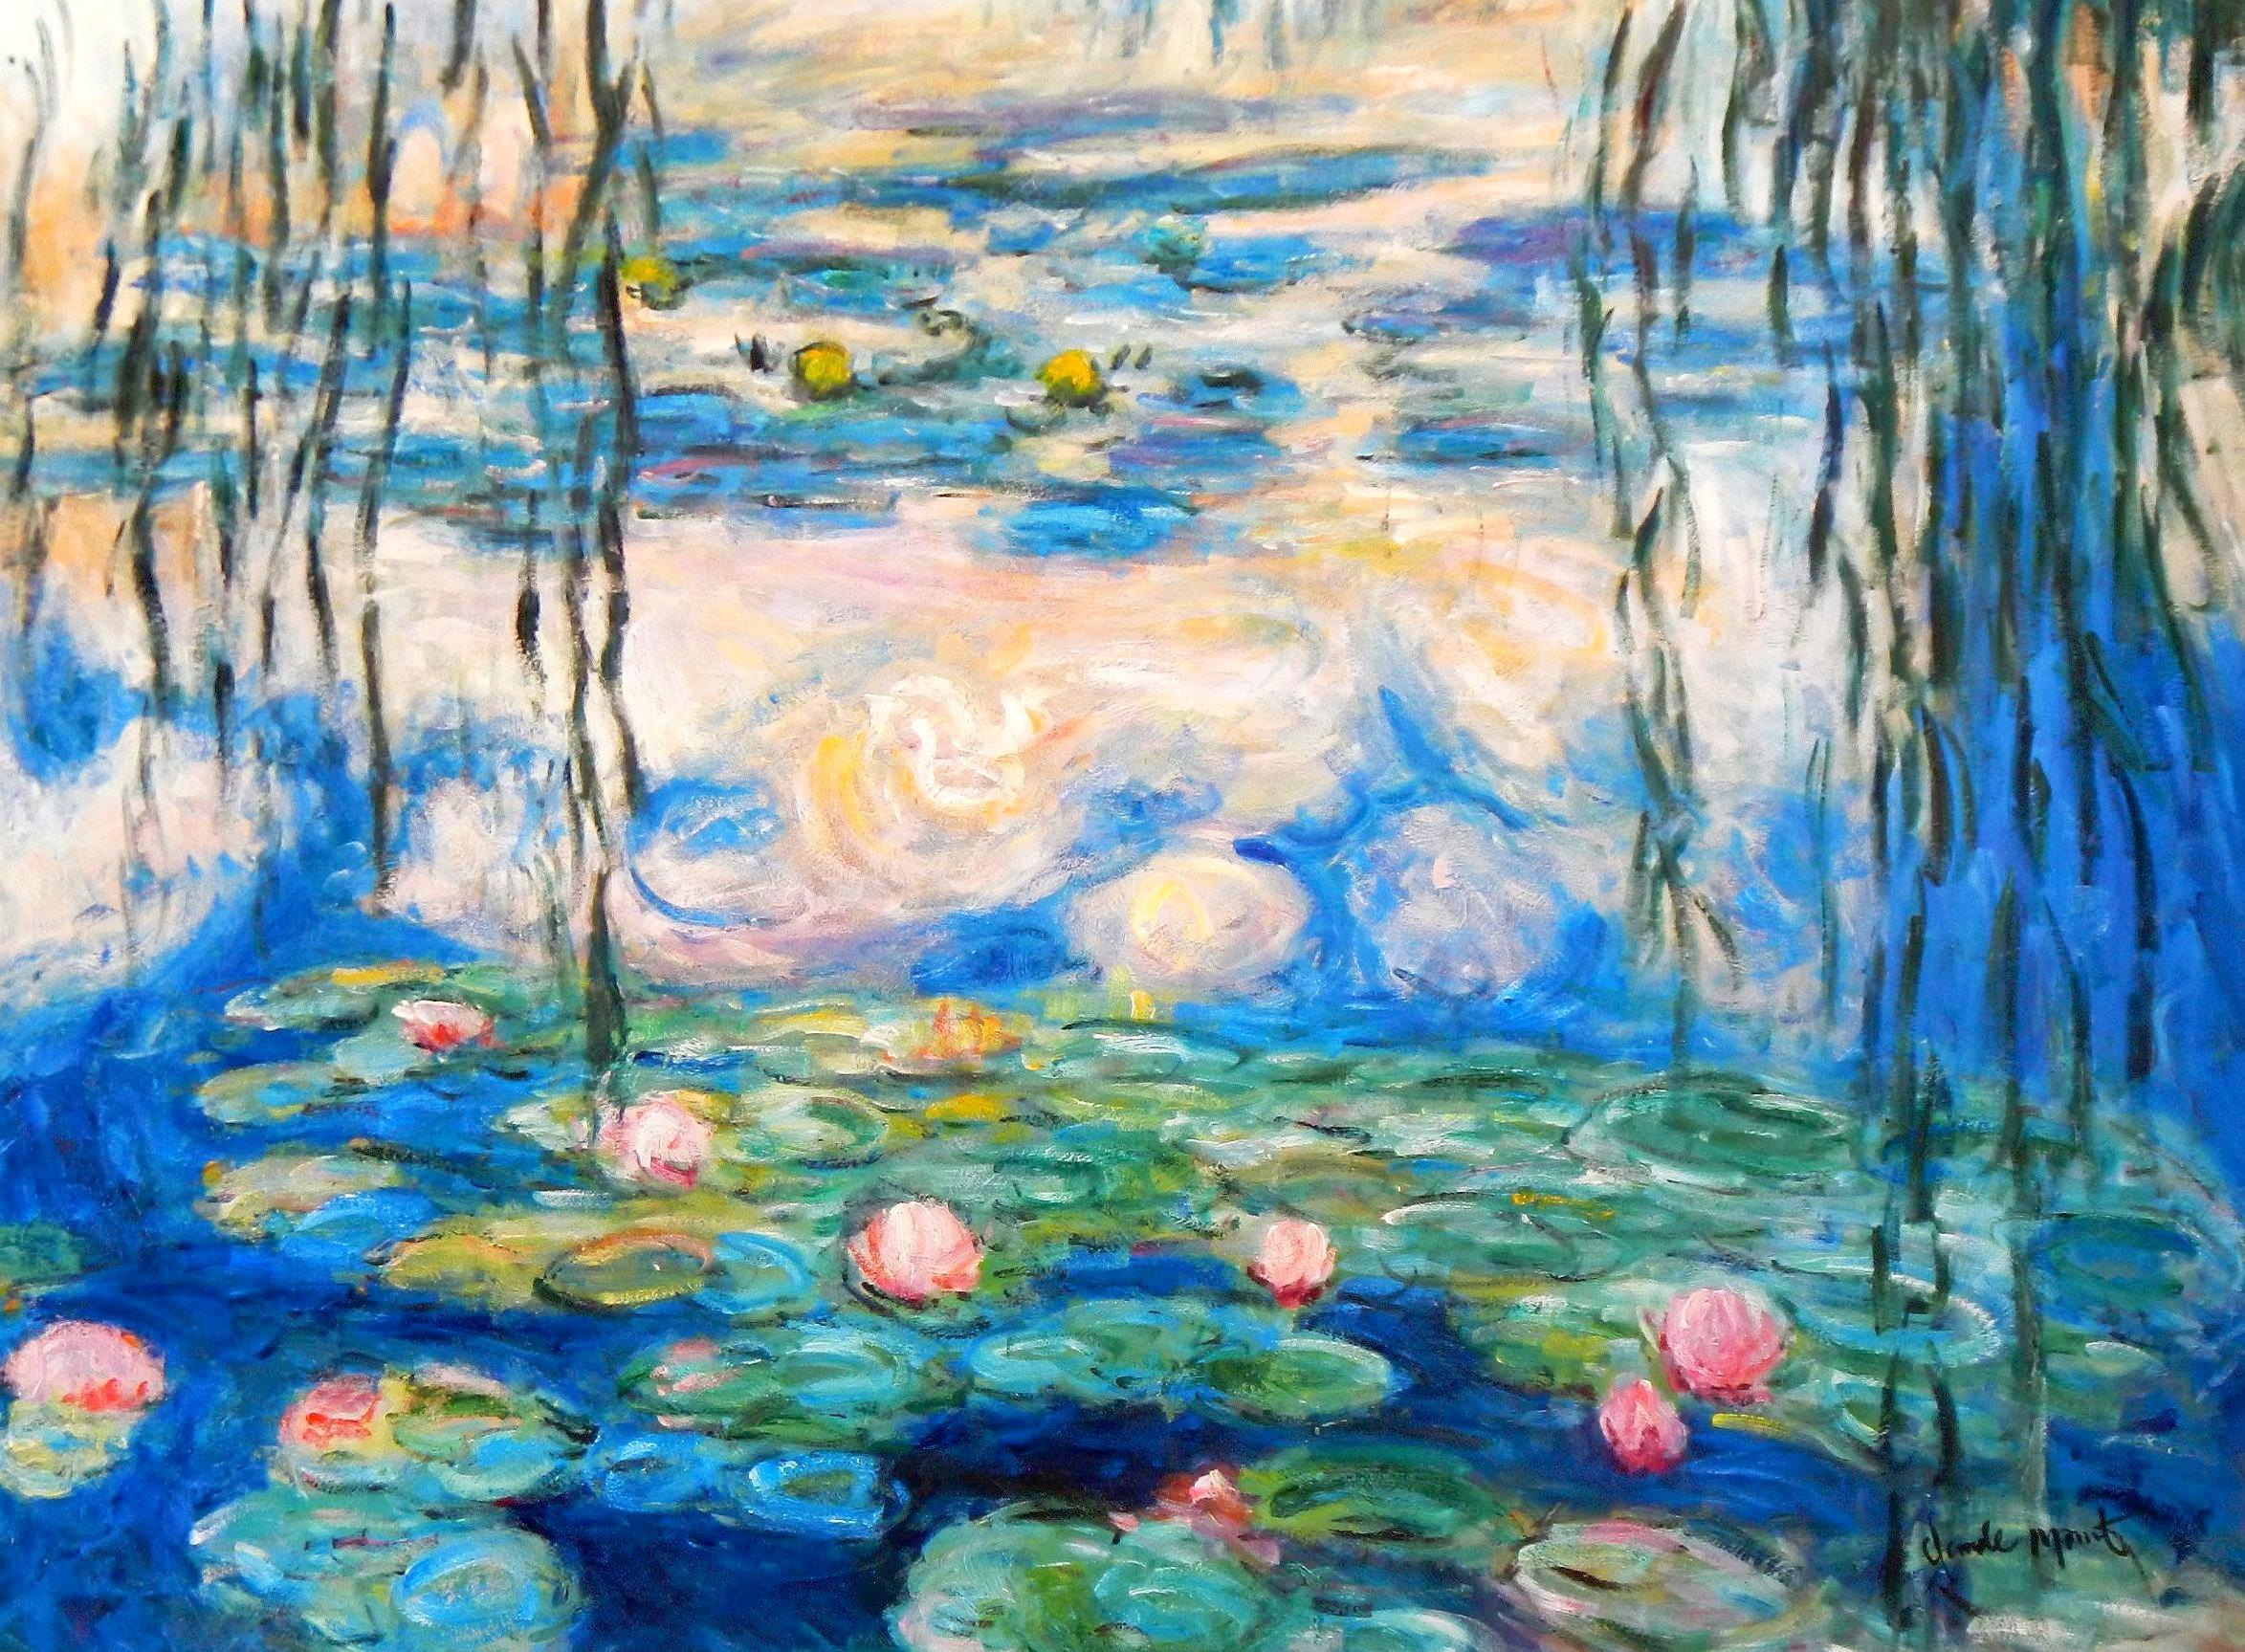 Claude Monet - Seerosen & Weiden i94050 80x110cm Ölbild handgemalt